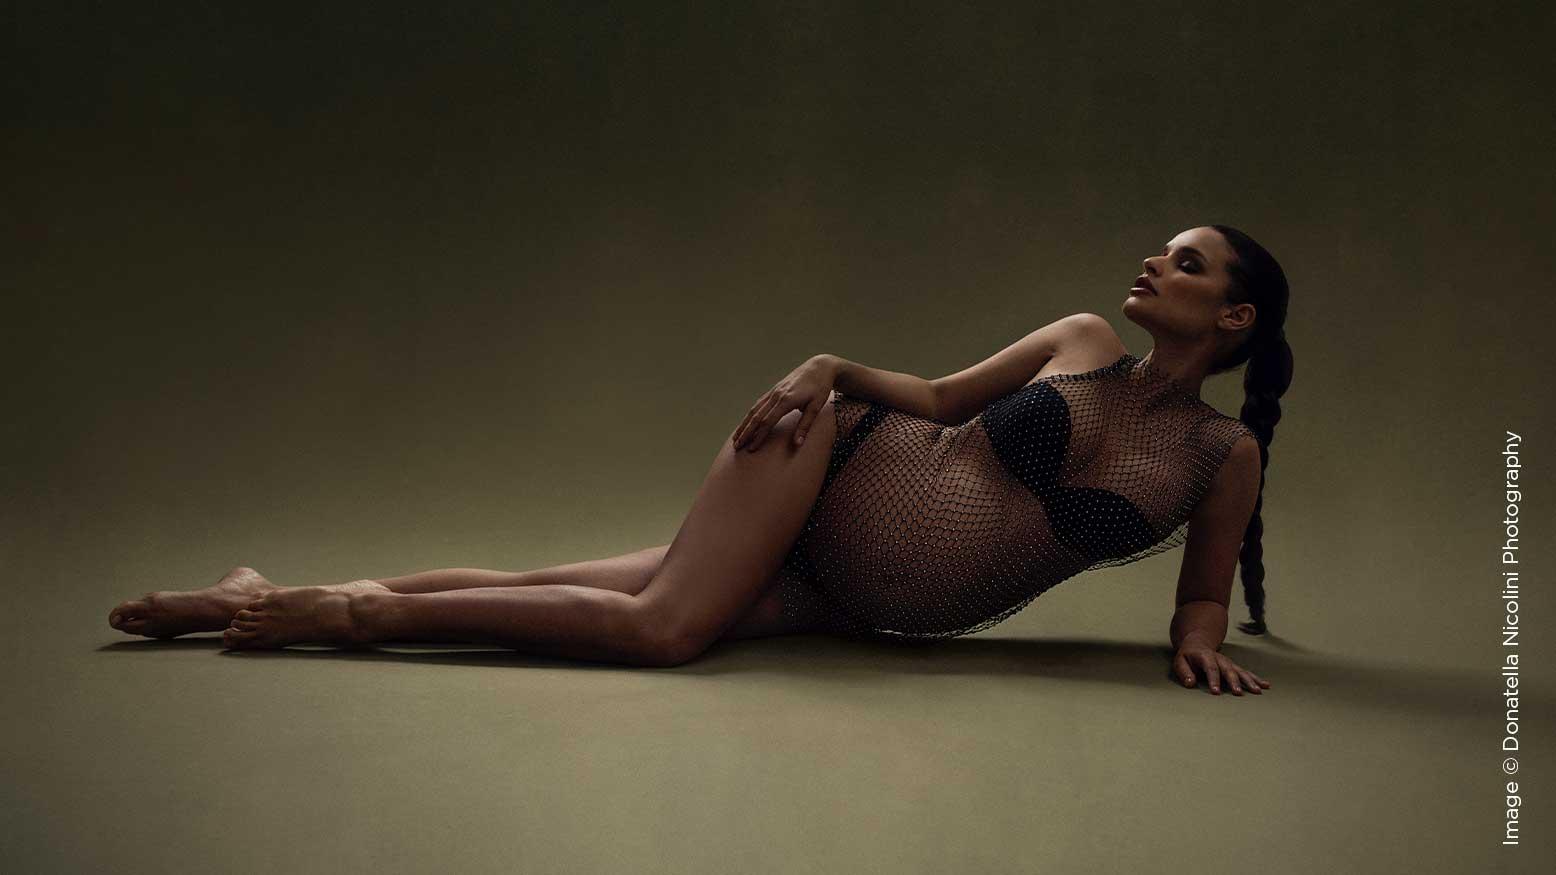 Maternity Posing